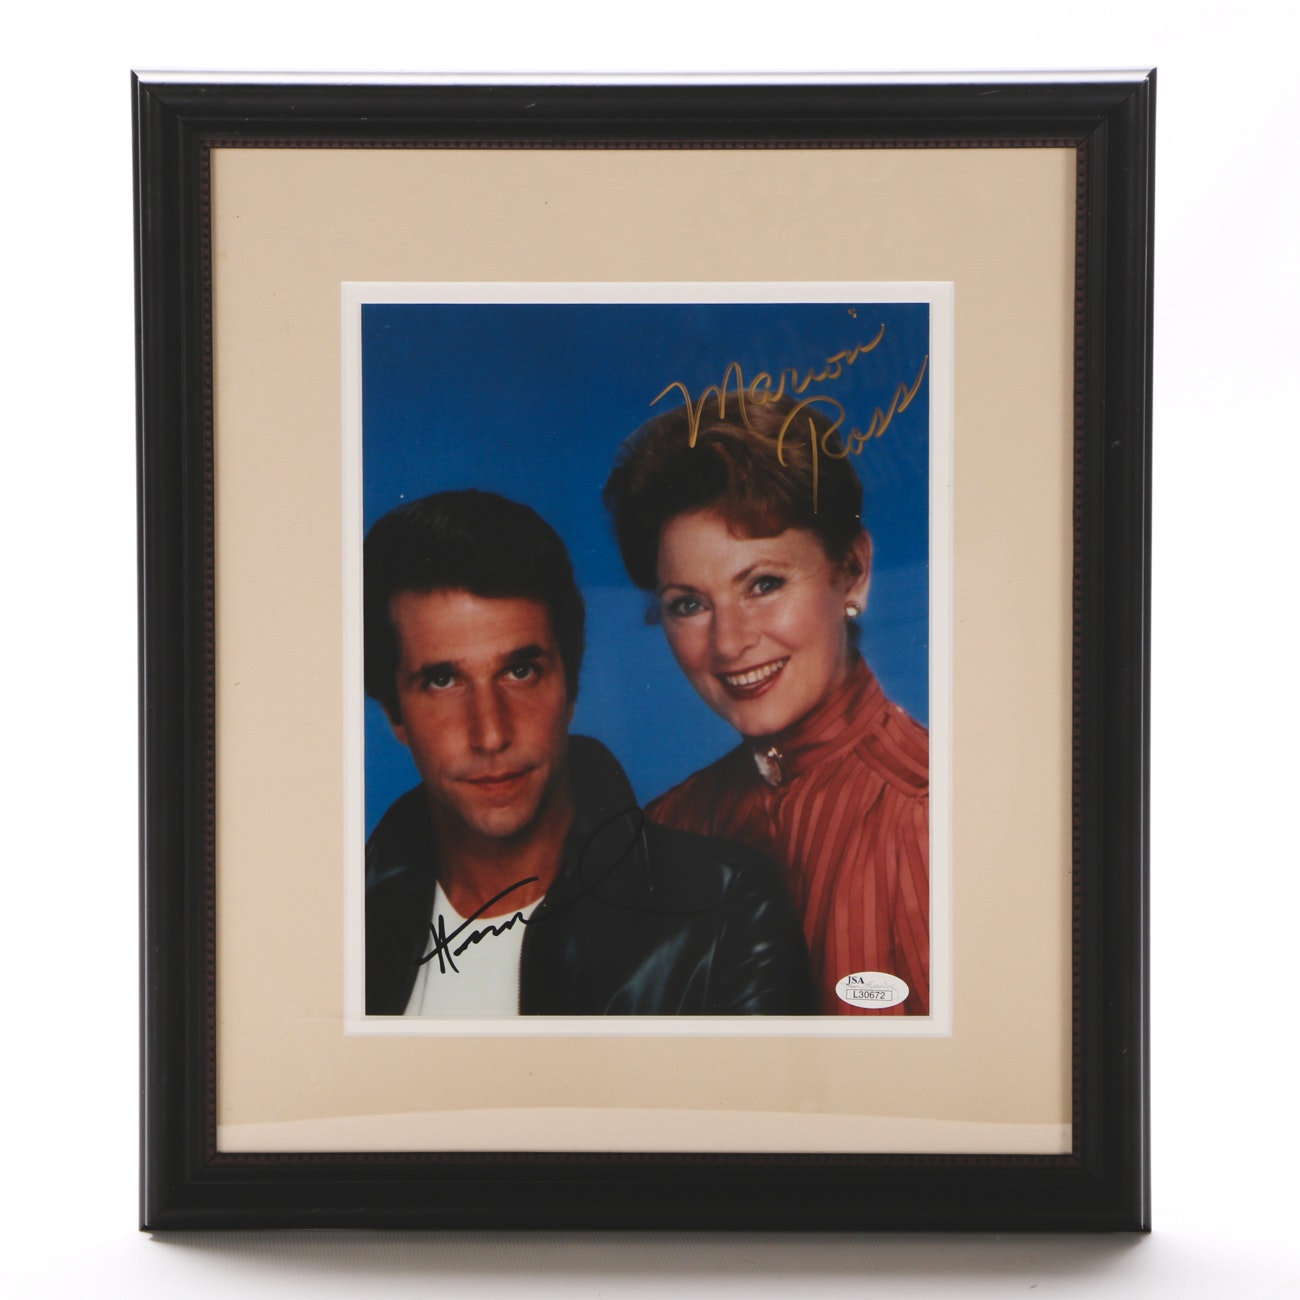 Happy Days TV Series Signed Framed Display JSA COA